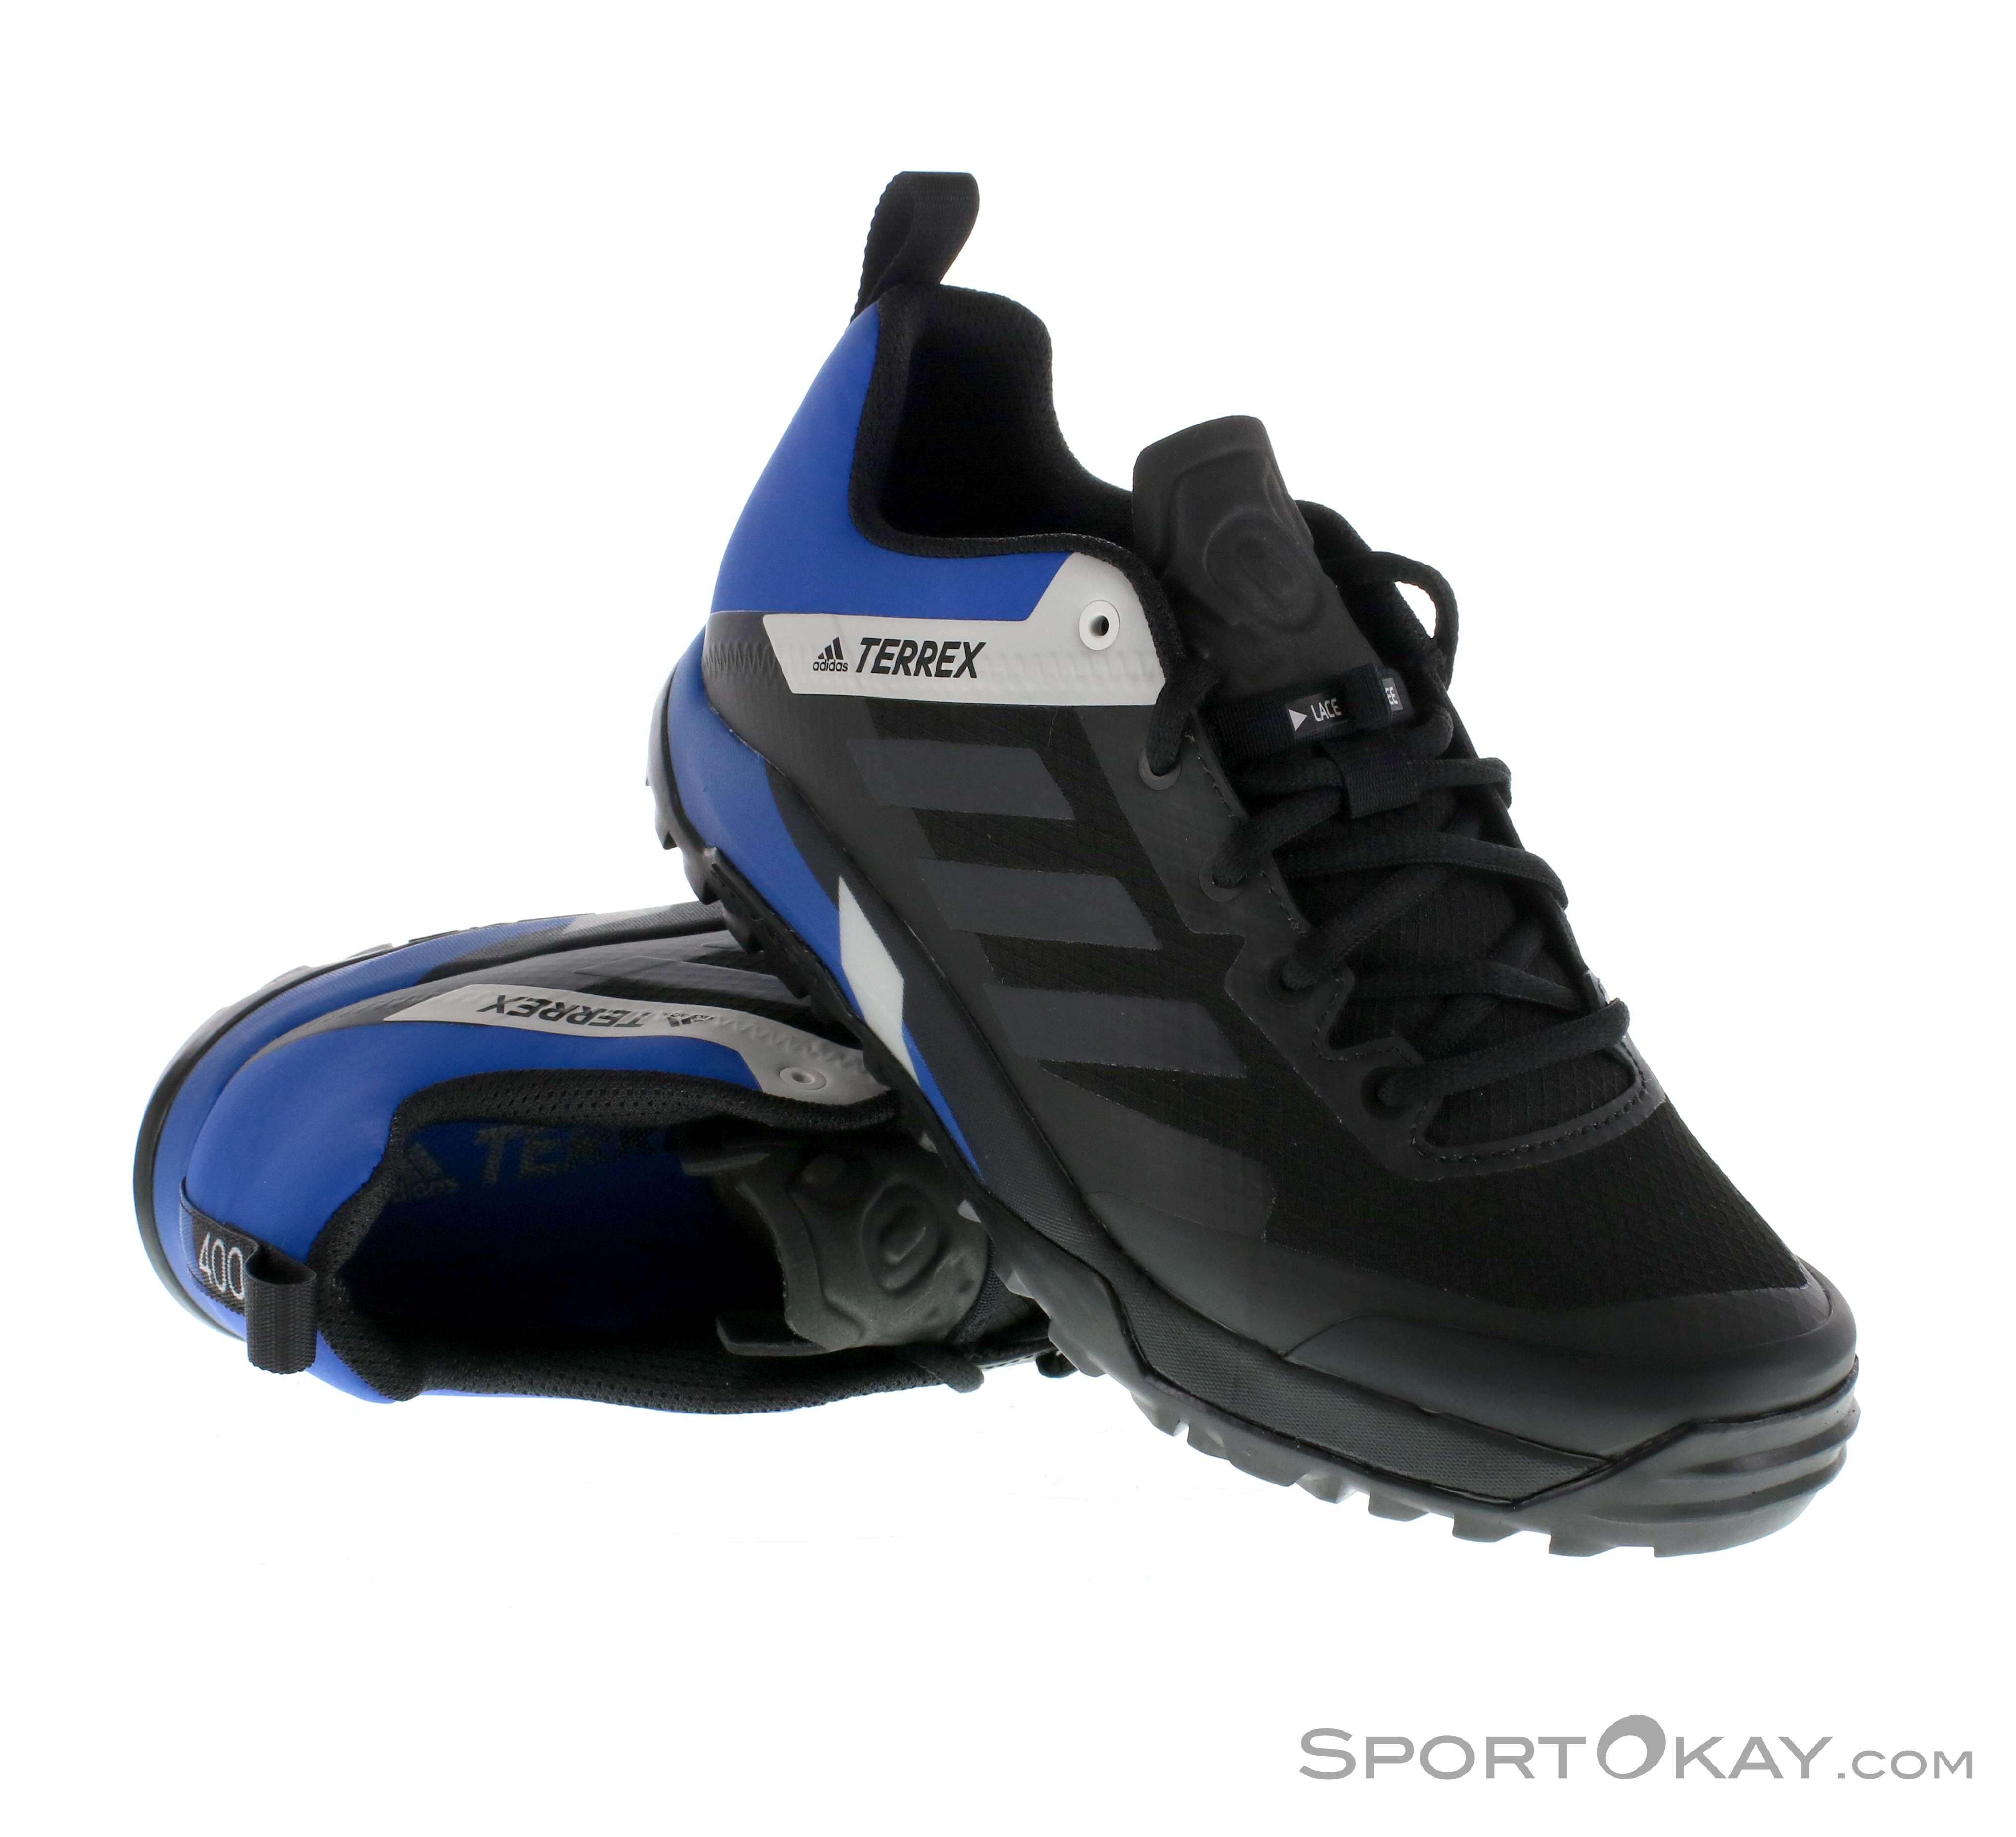 popular stores skate shoes brand new adidas adidas Terrex Trail Cross SL Herren Bikeschuhe